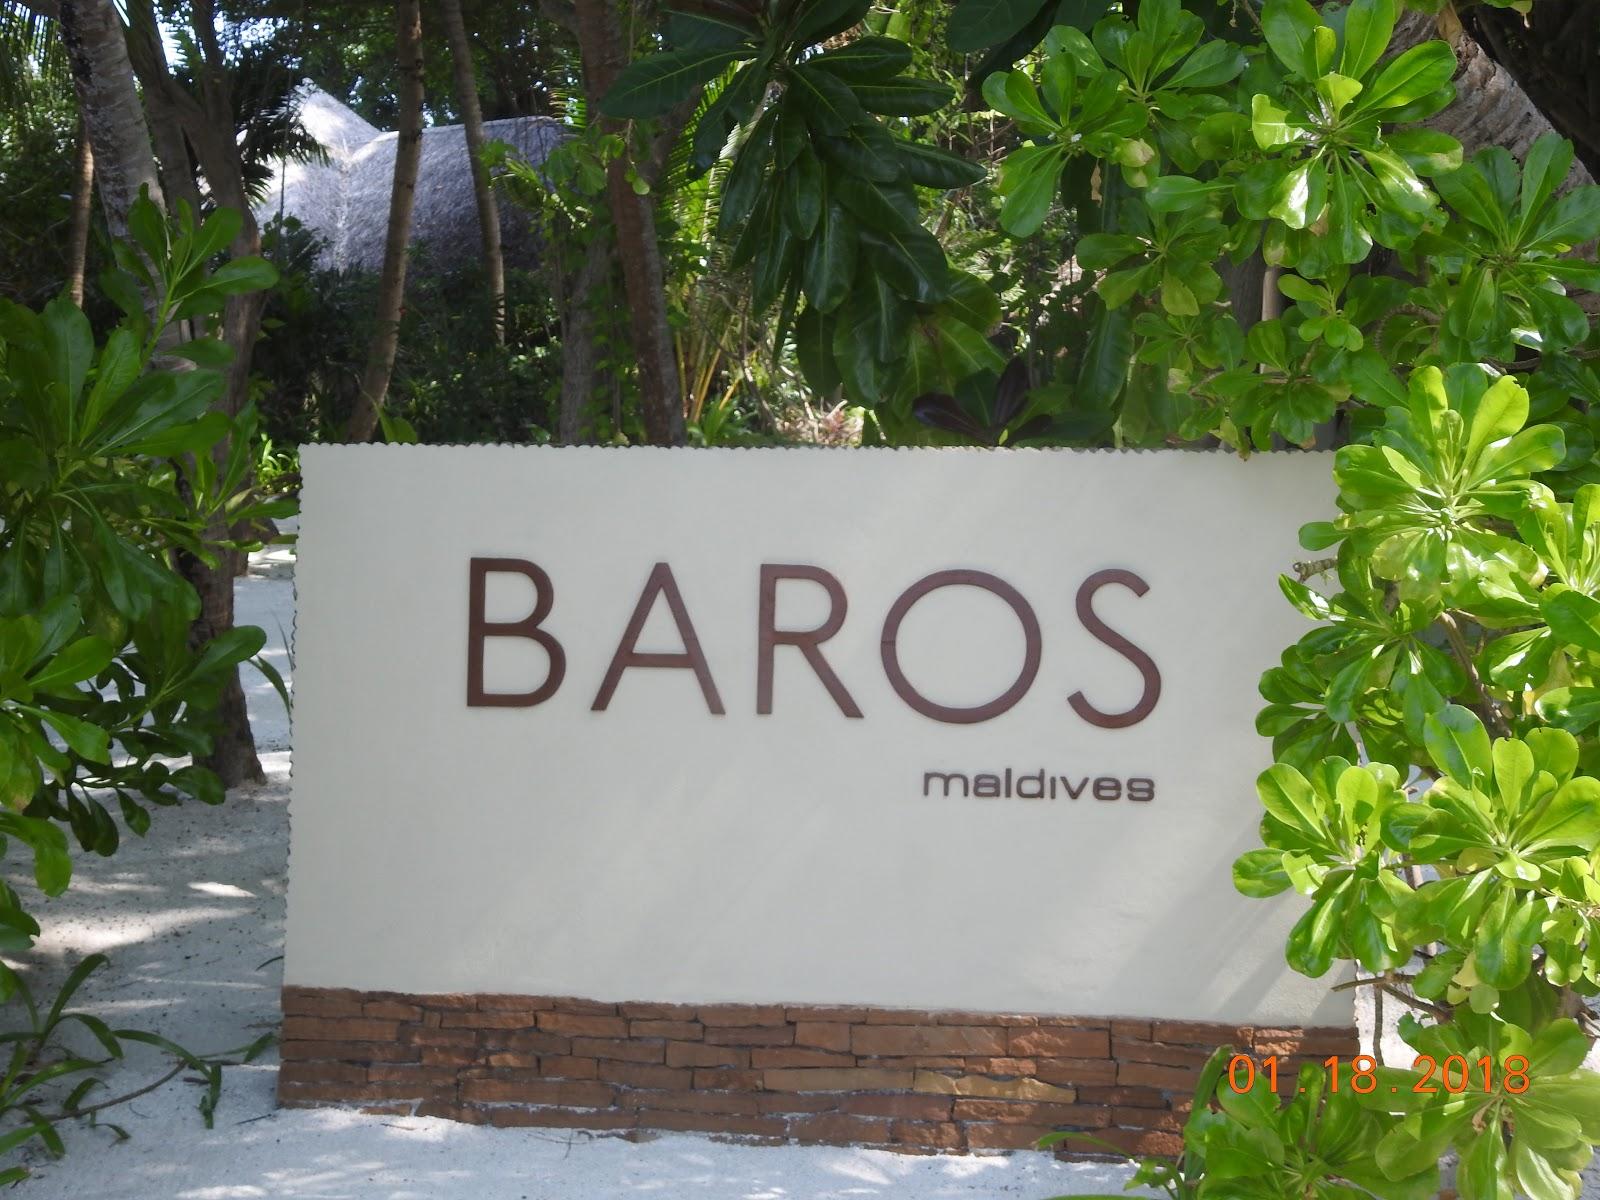 invite-to-paradise-sri-lanka-maldives-holiday-specialists-nutan-vidyut-patel-baros-3.jpg